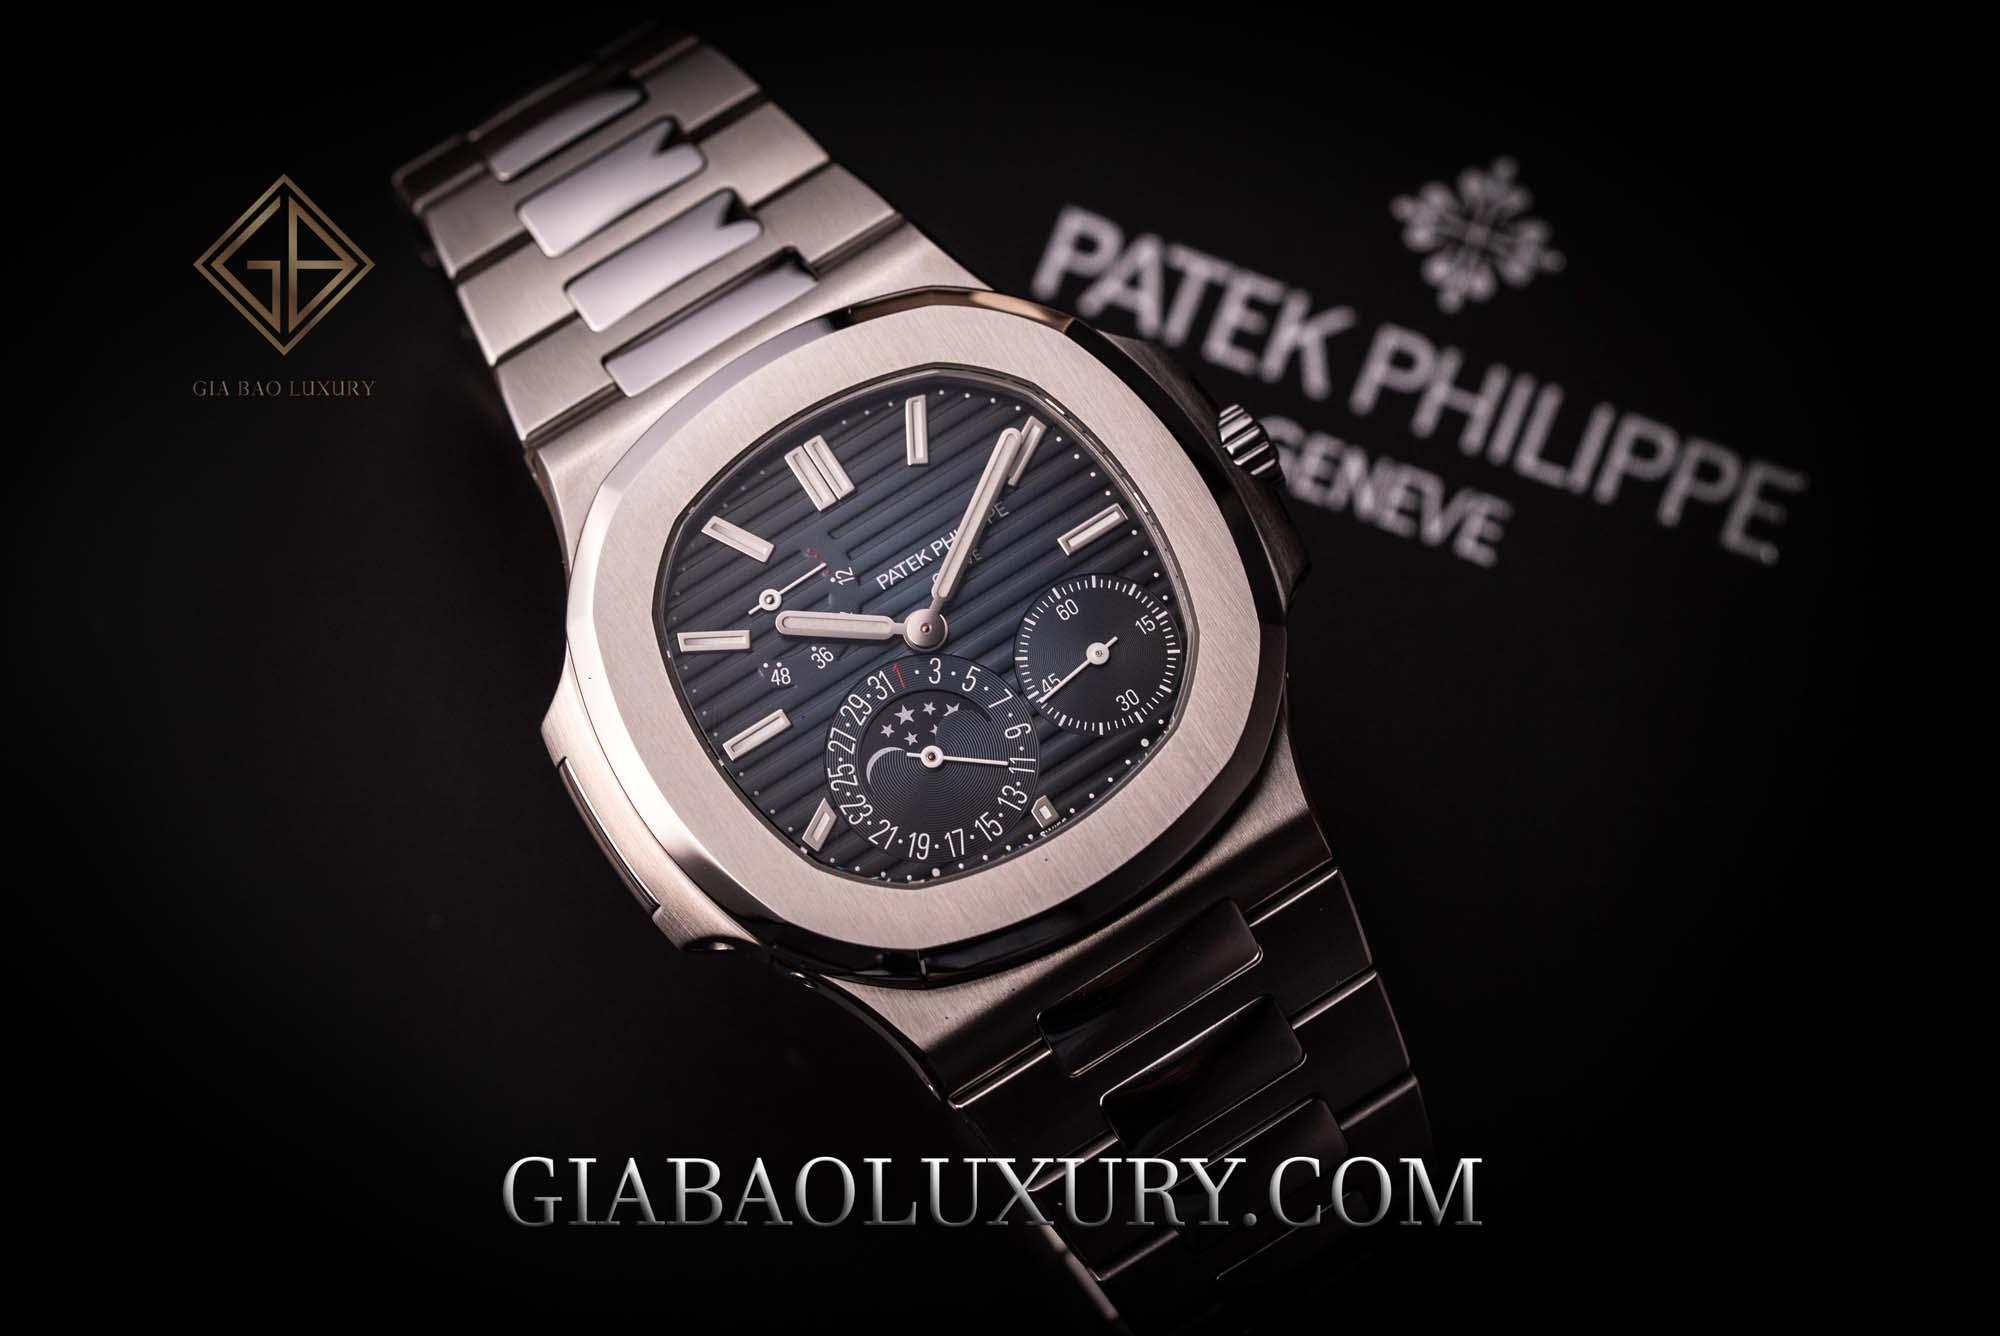 Đồng hồ Patek Philippe Nautilus 5712/1A-001